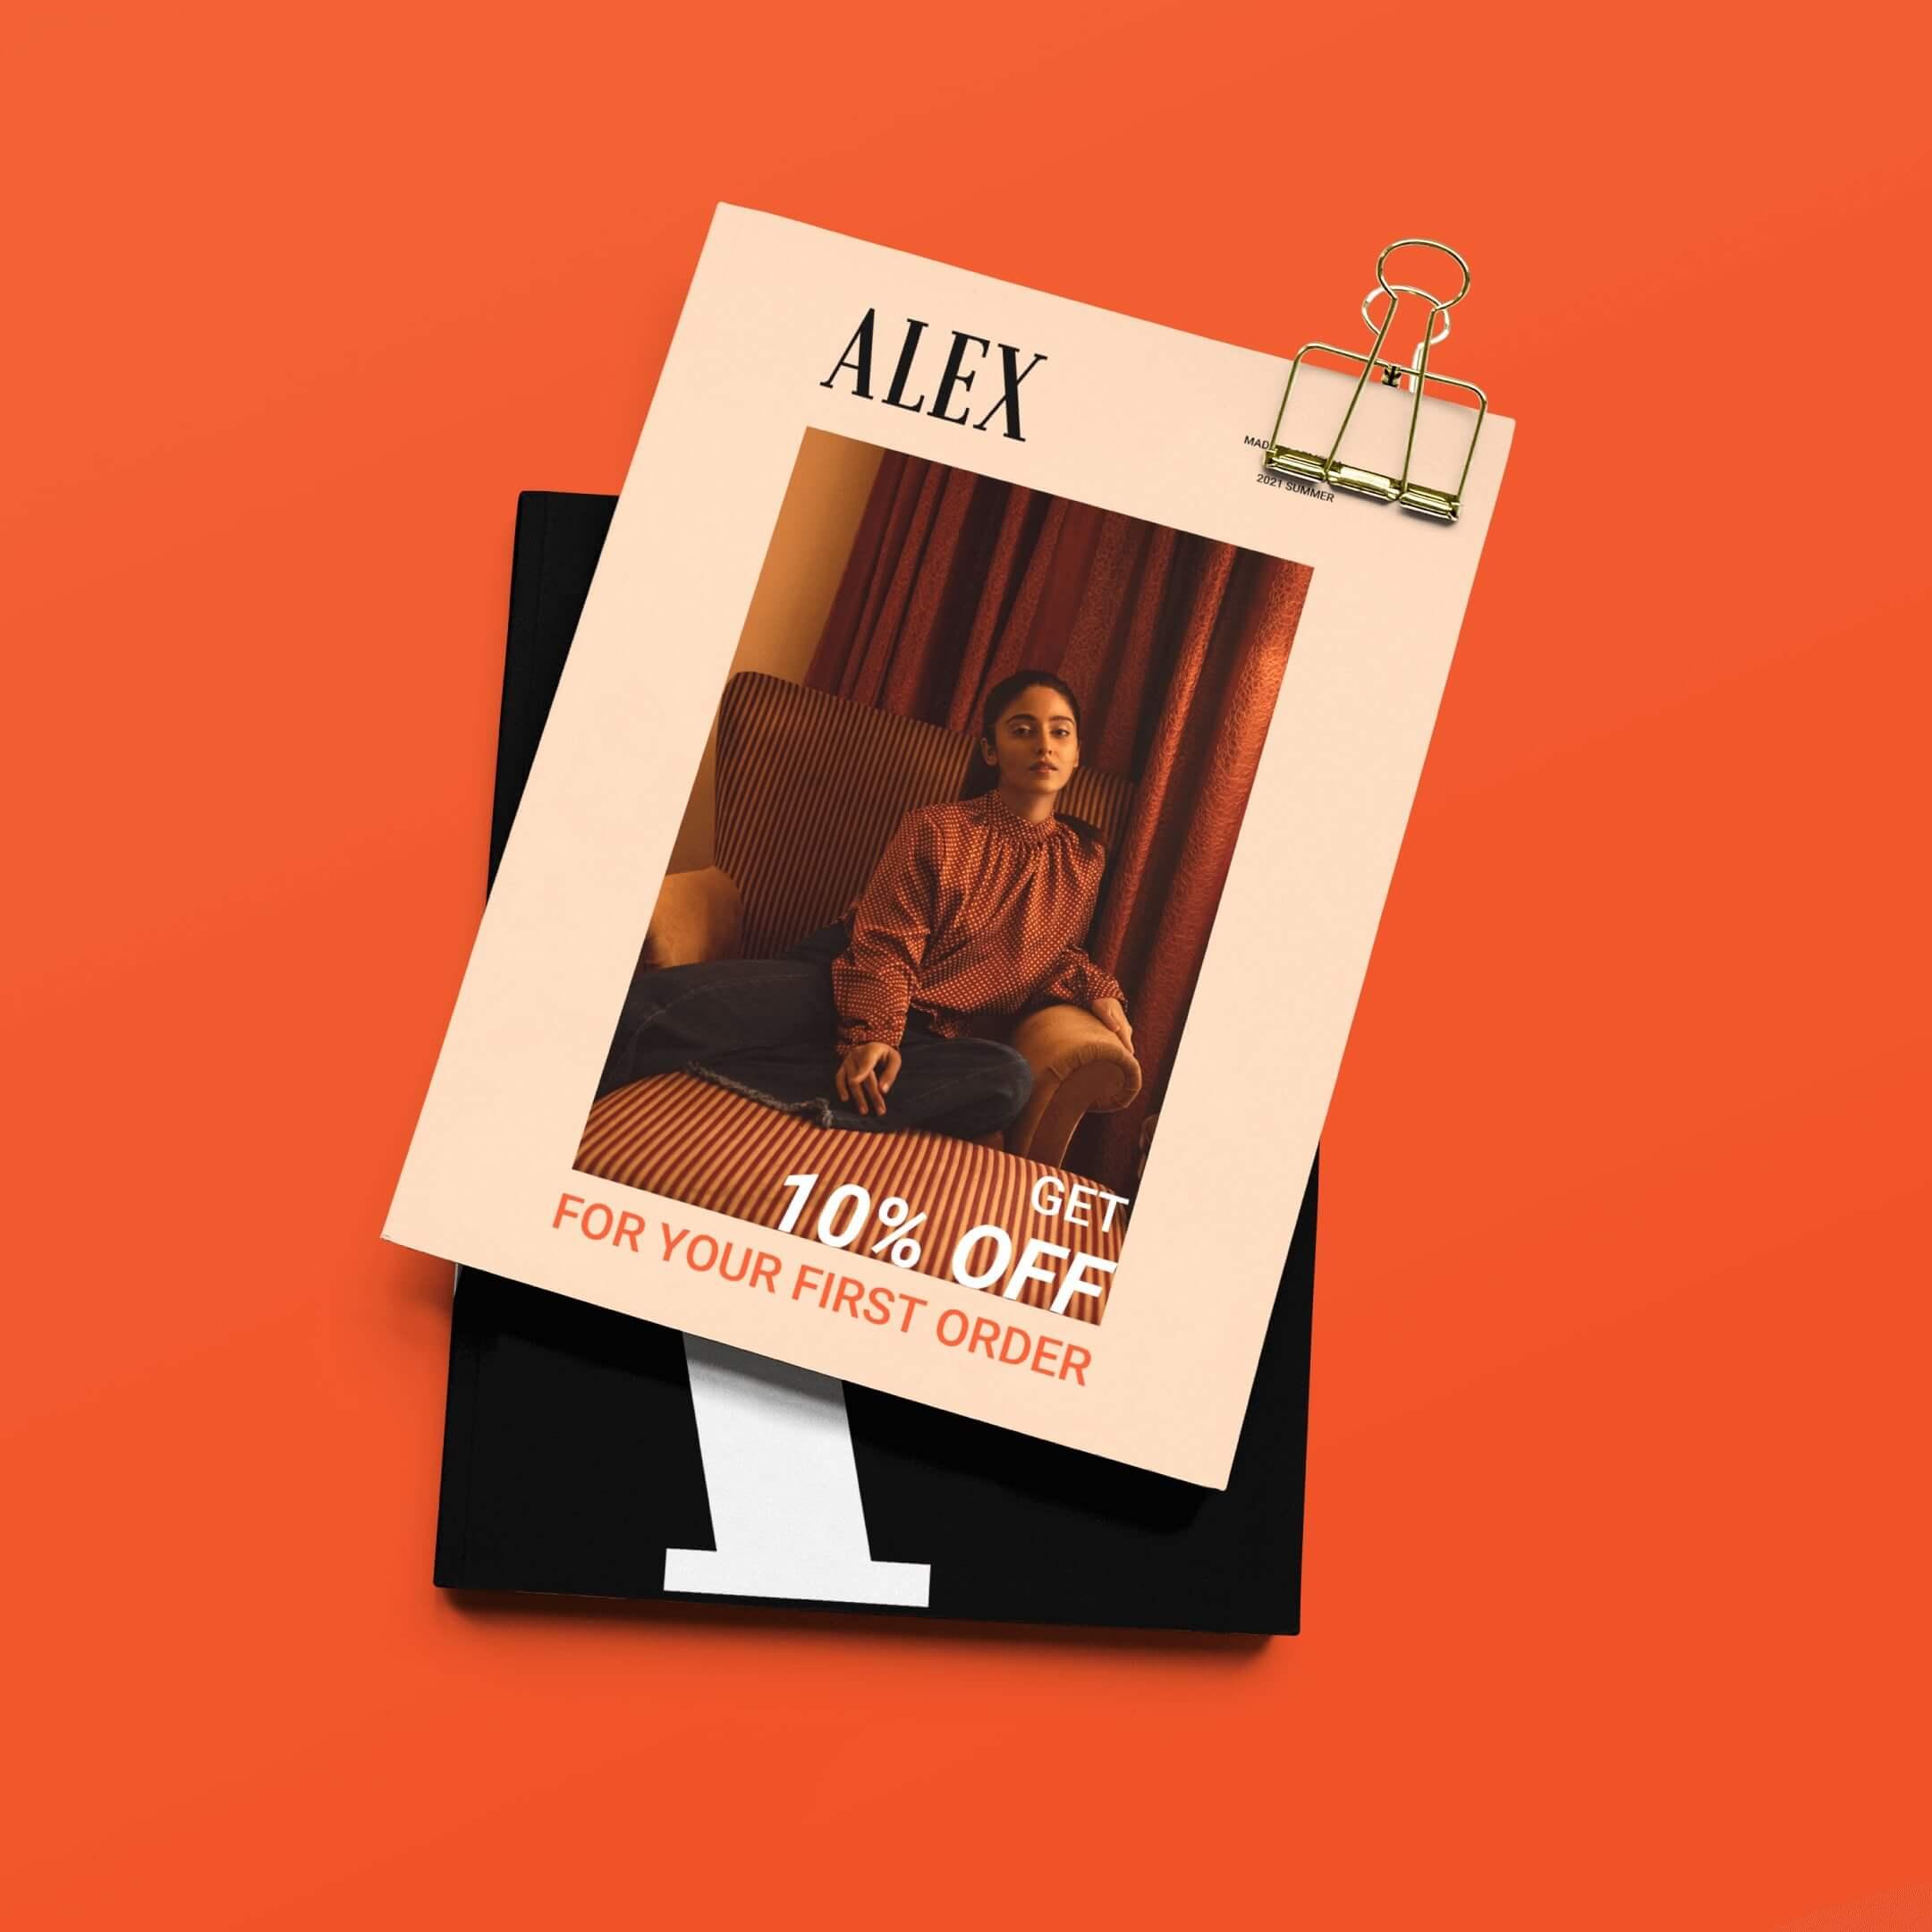 Alex Retail Store